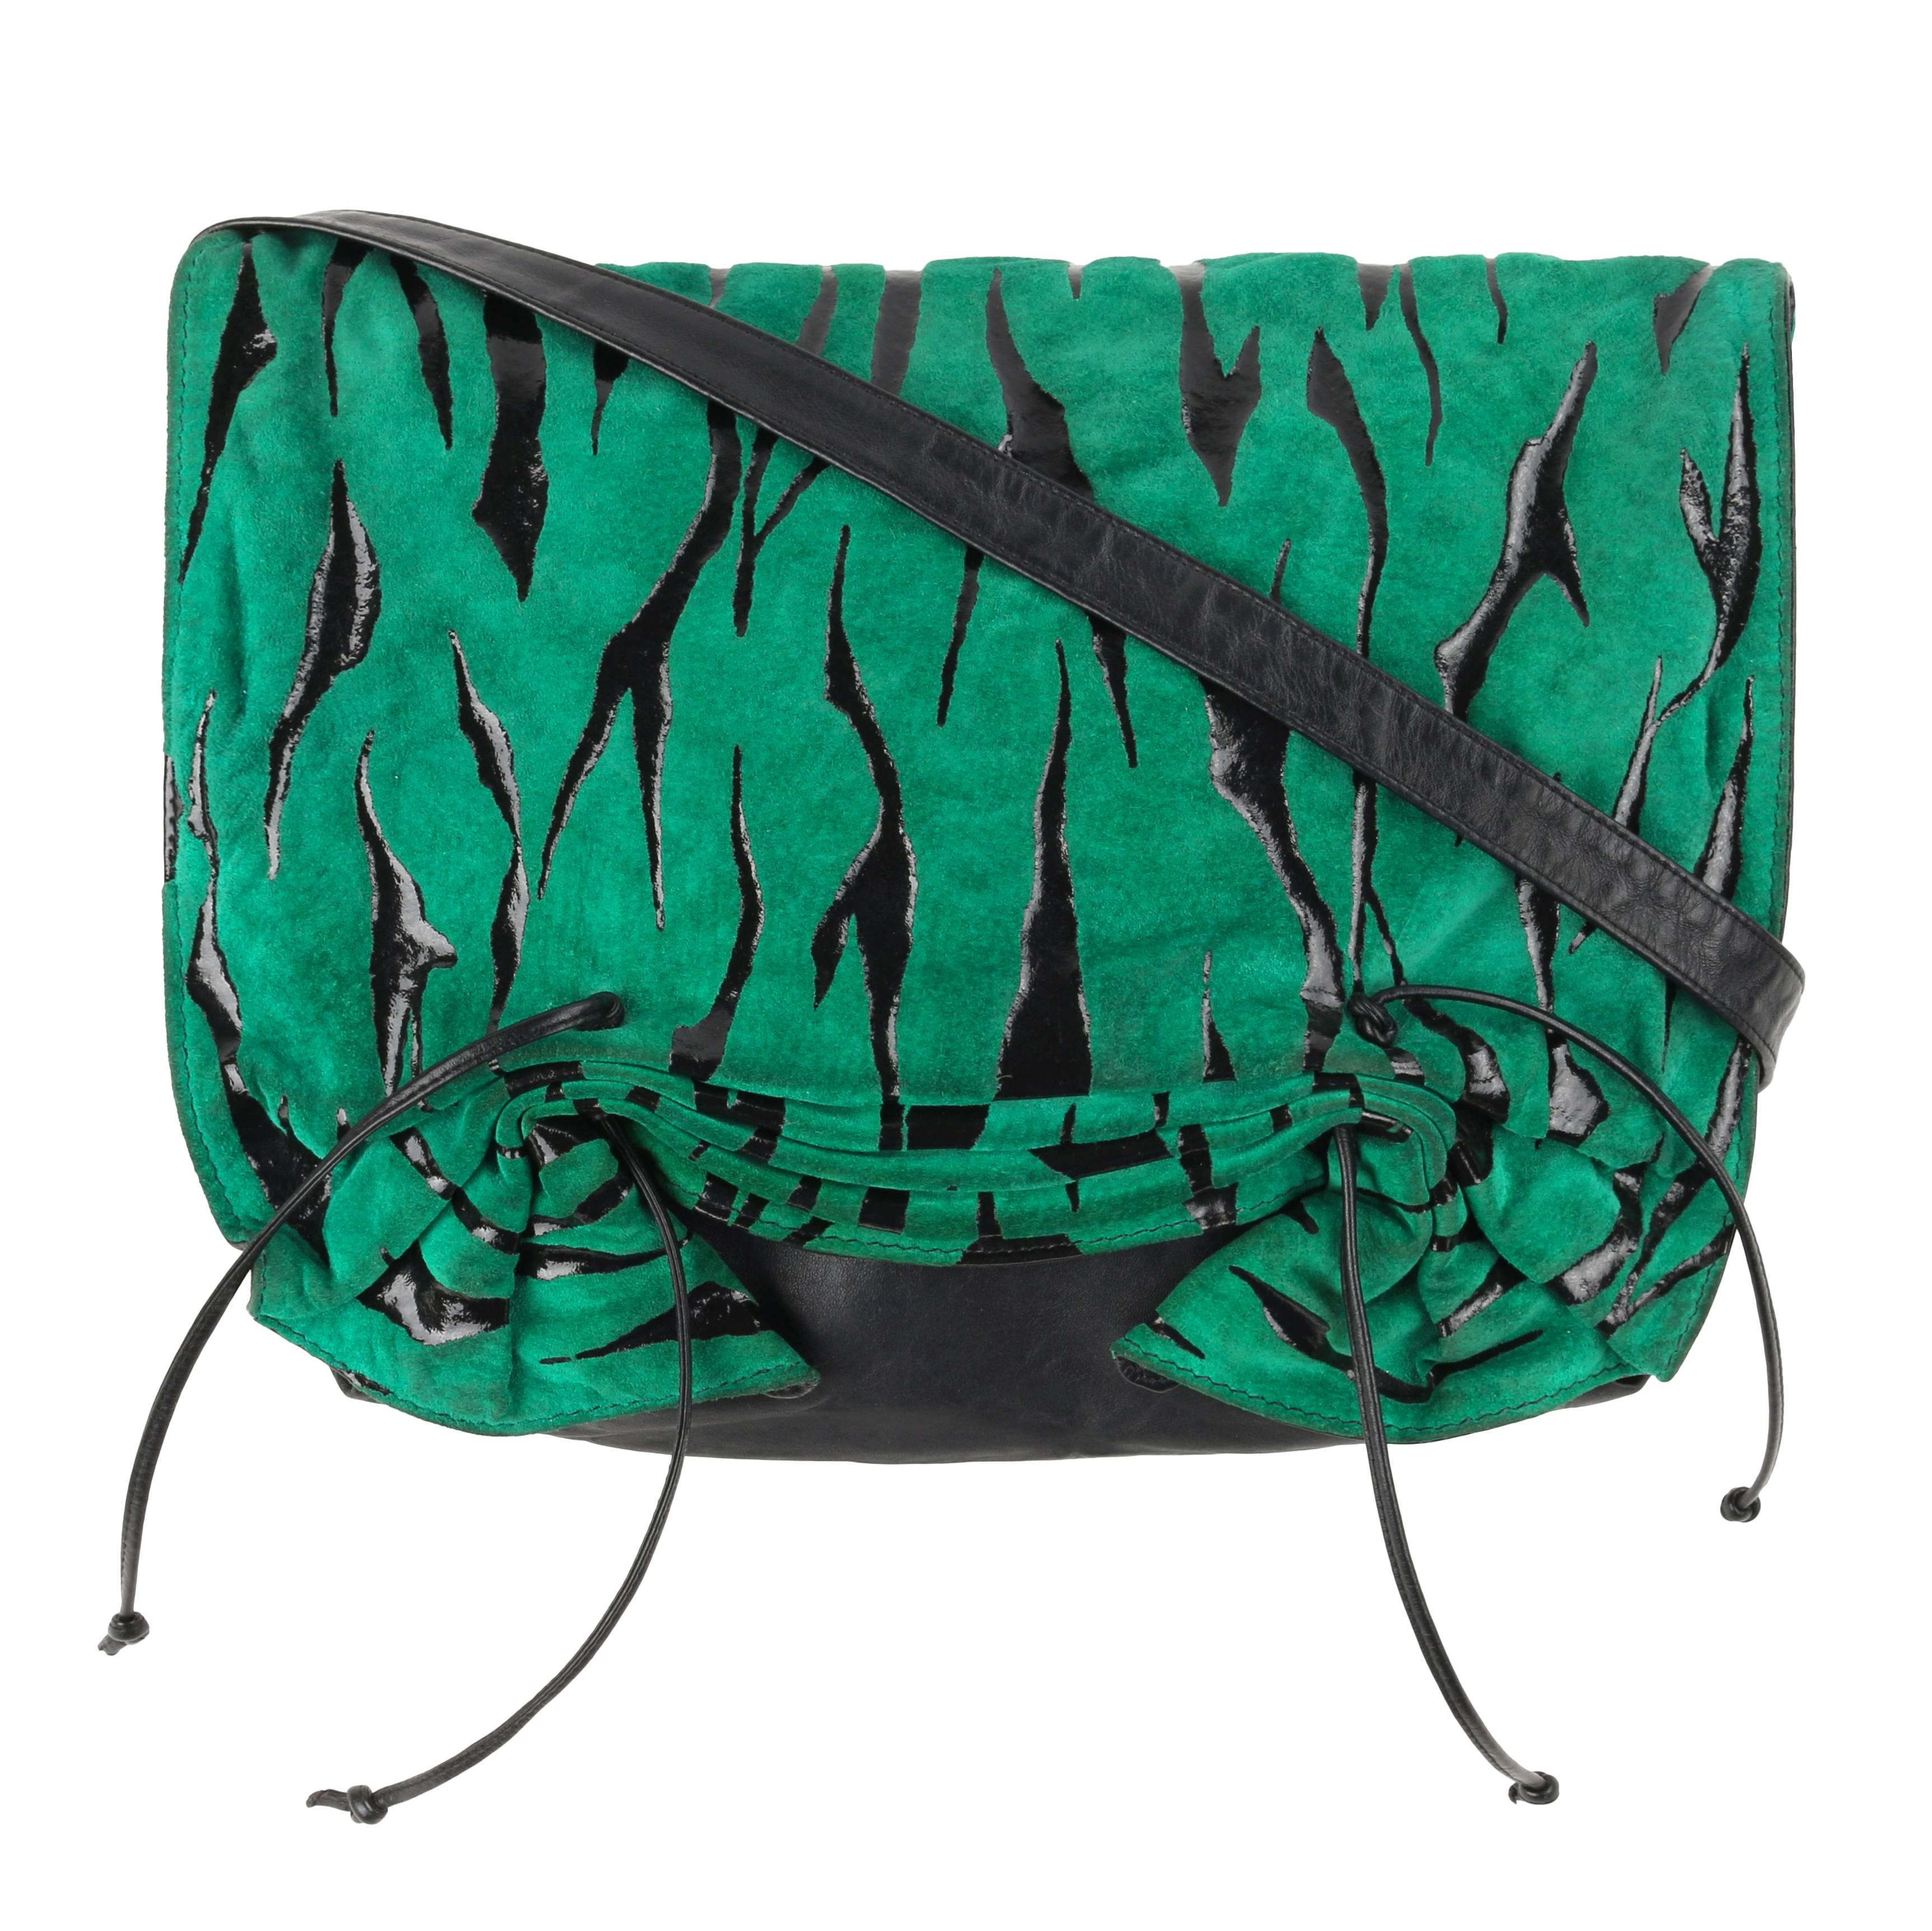 CARLOS FALCHI c.1980's Green Tiger Stripe Suede Leather Pleated Crossbody Bag